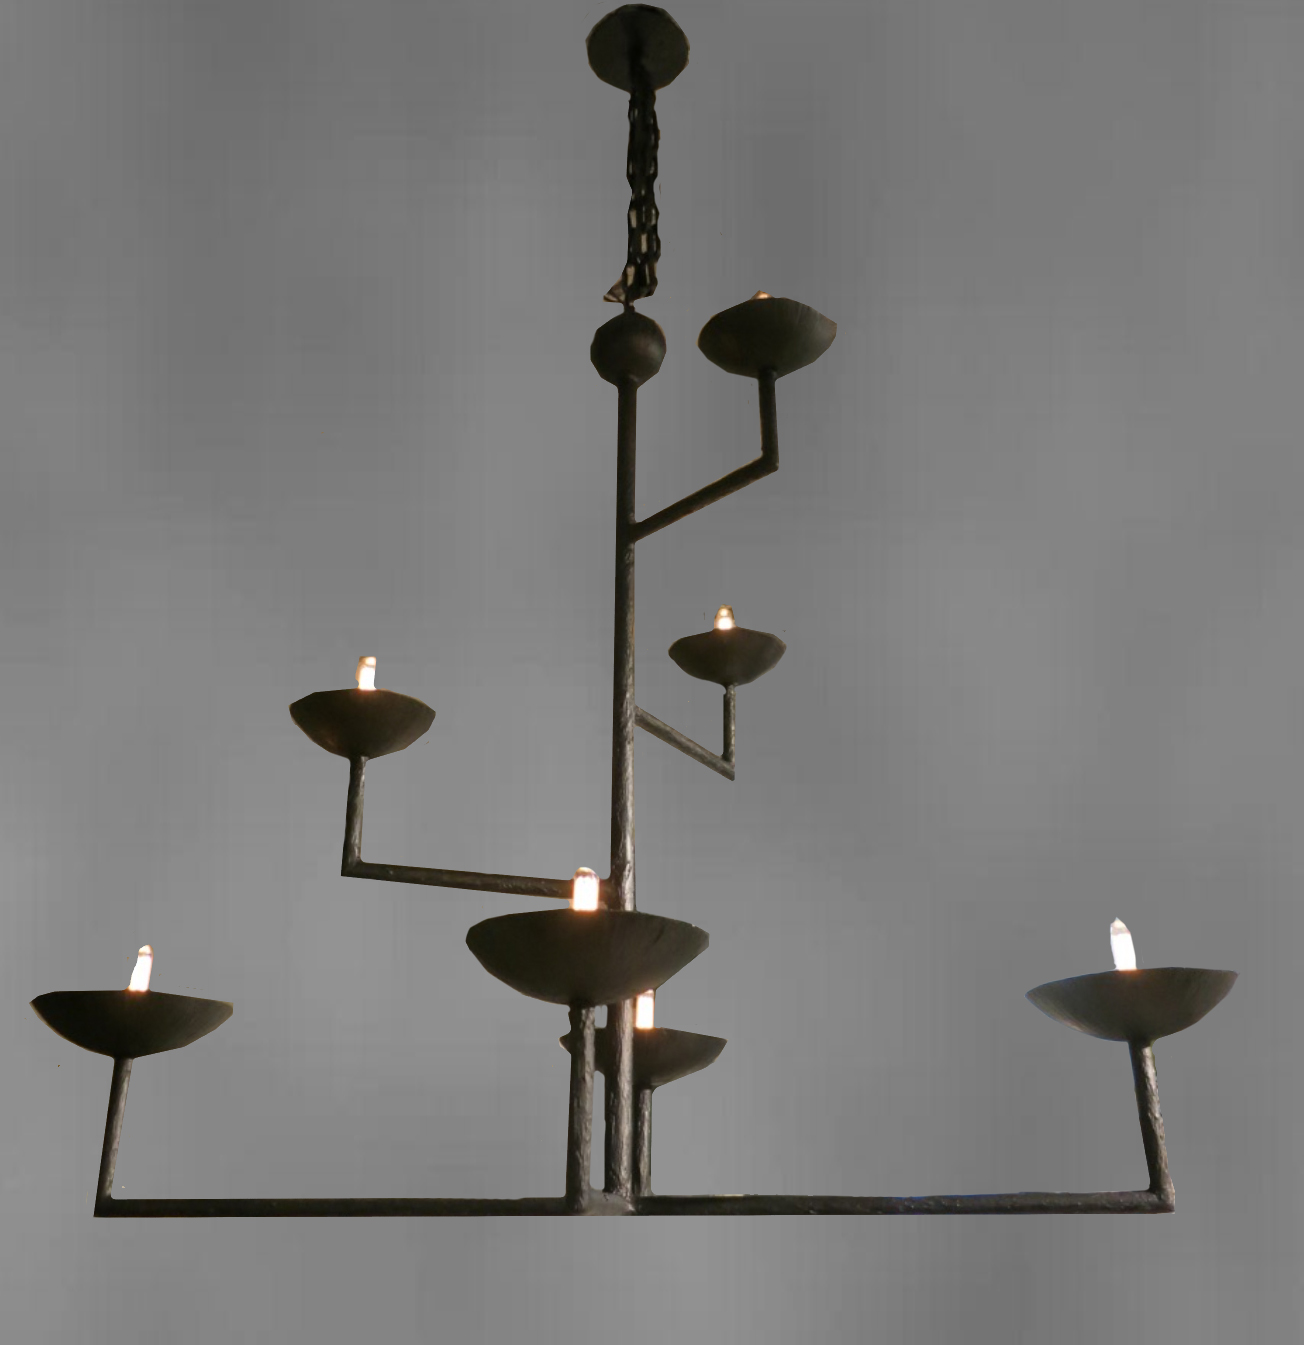 competitive price 34984 200ea Bronze Plaster Chandelier — A P S A R A I N T E R I O R